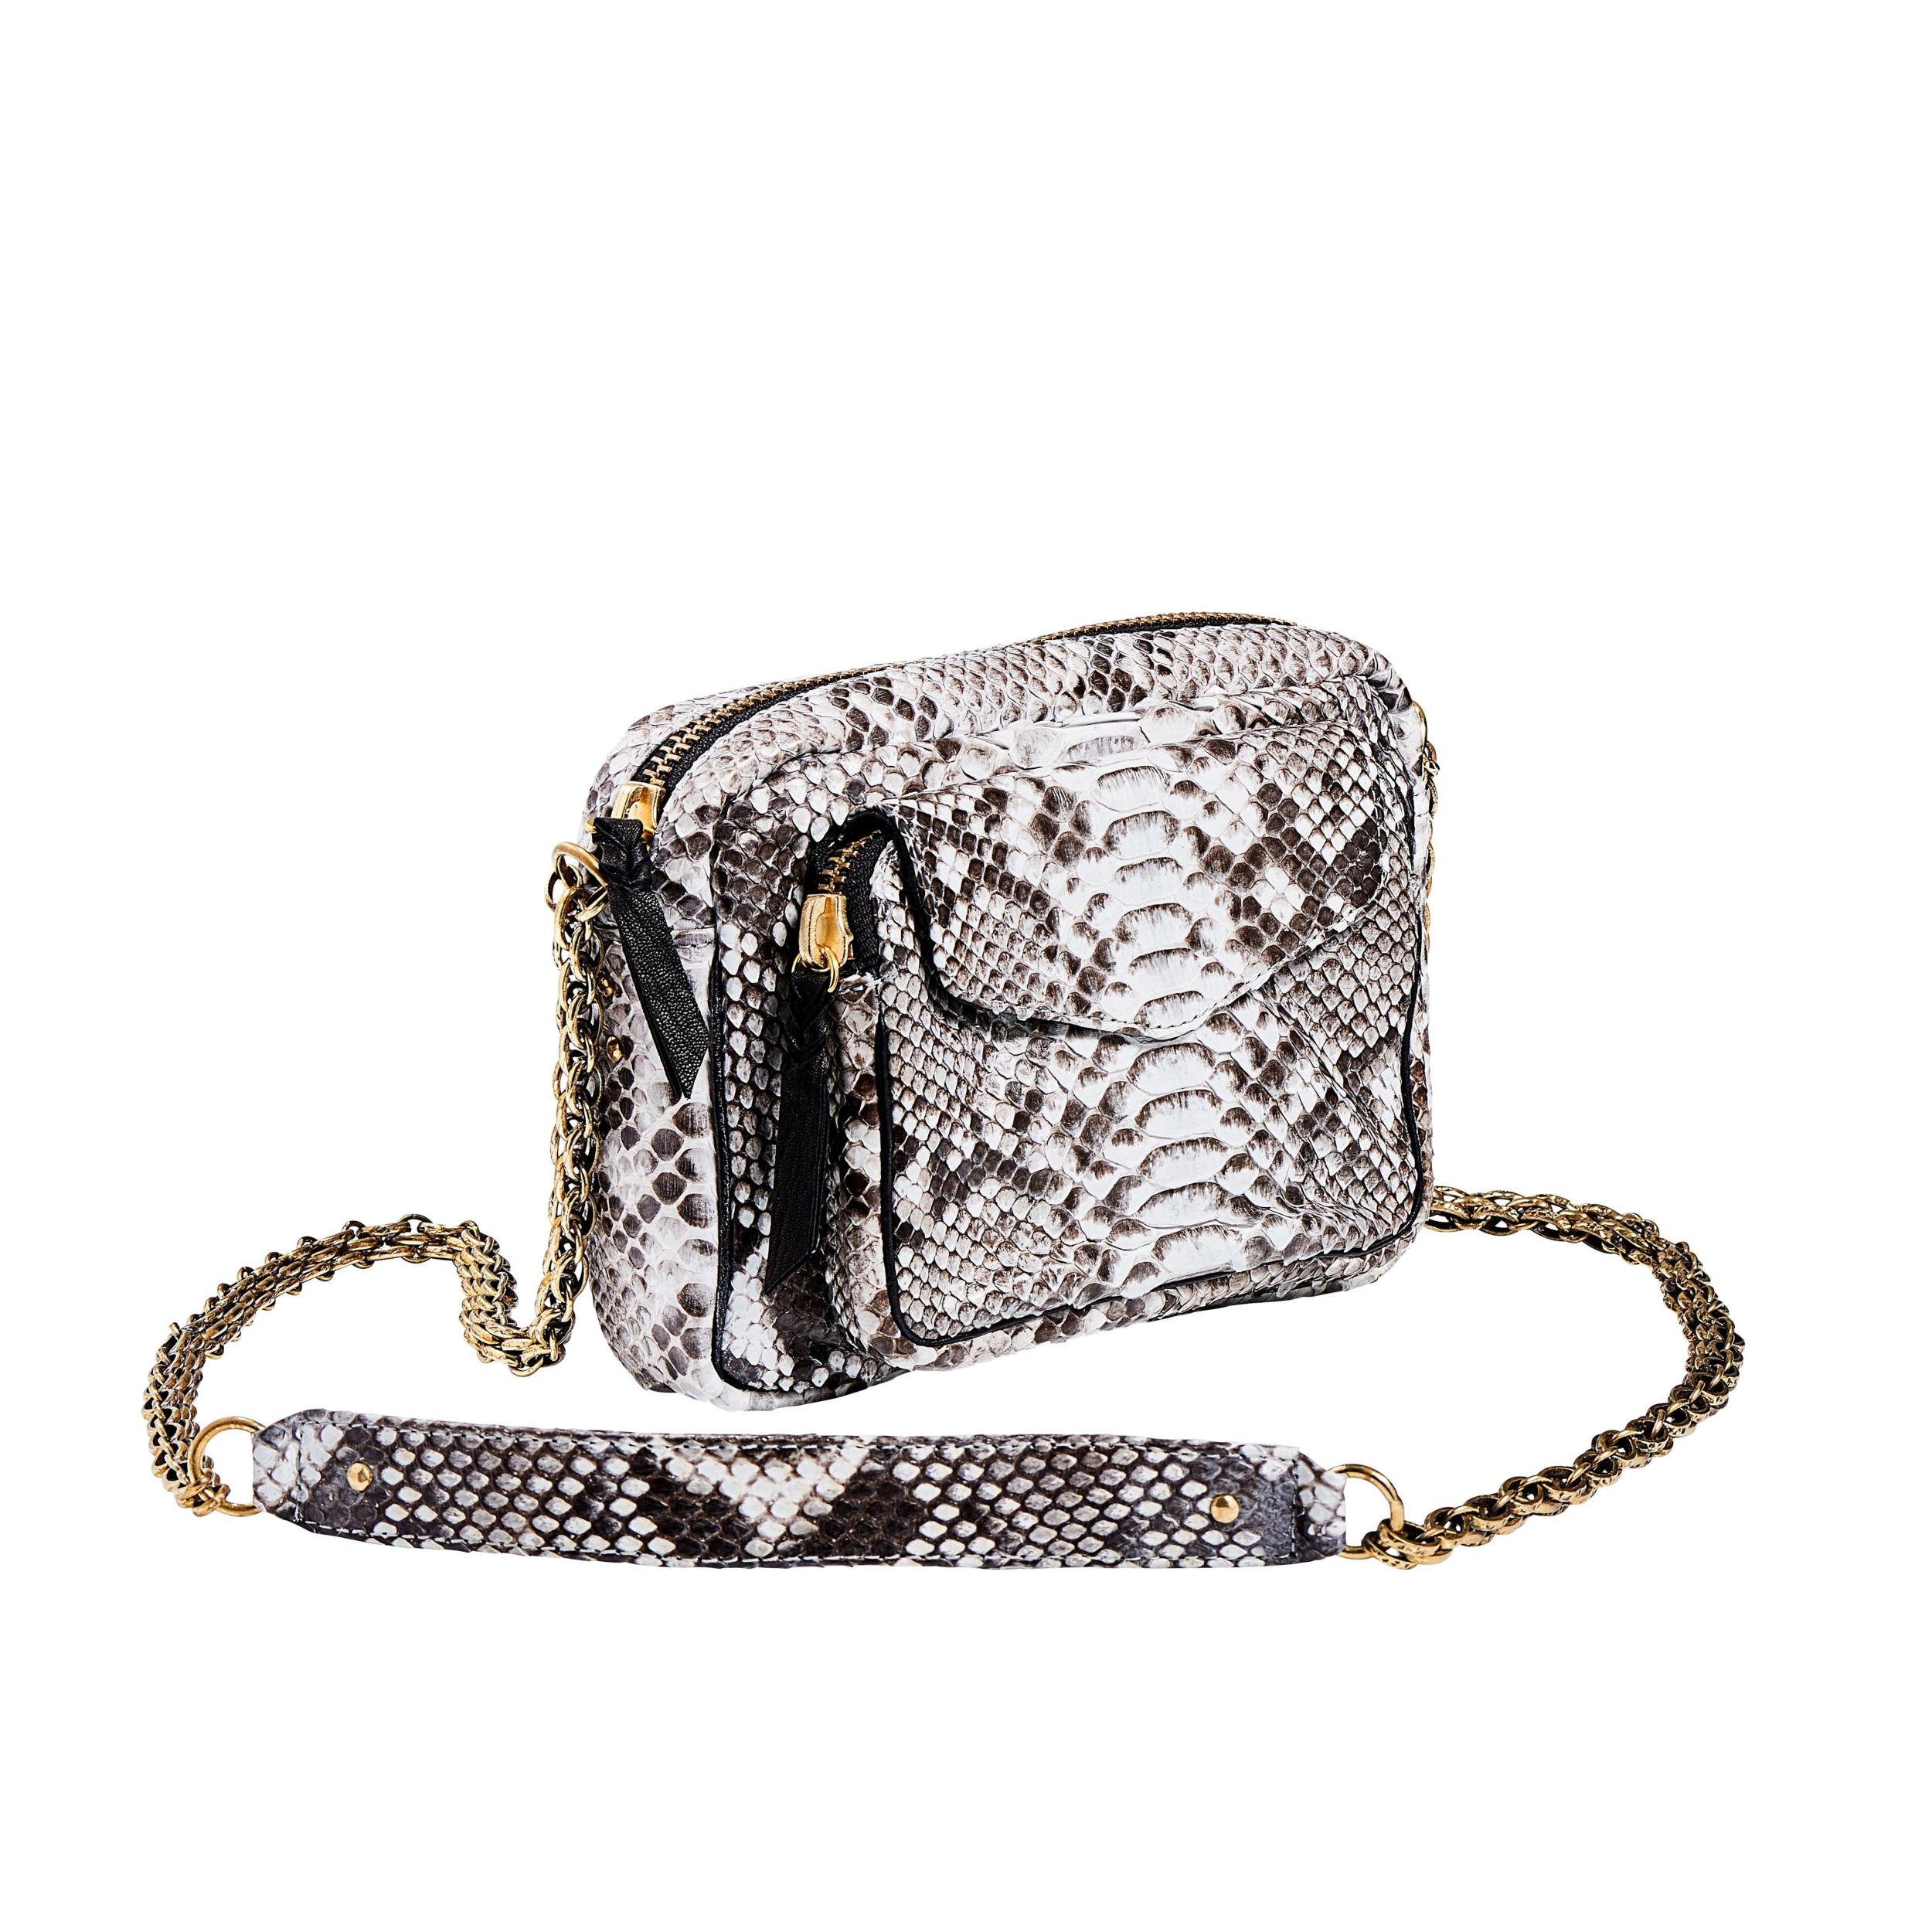 Diamond Claris Charly Boutique Or Sac Python Virot So Bijoux DH2E9WIY